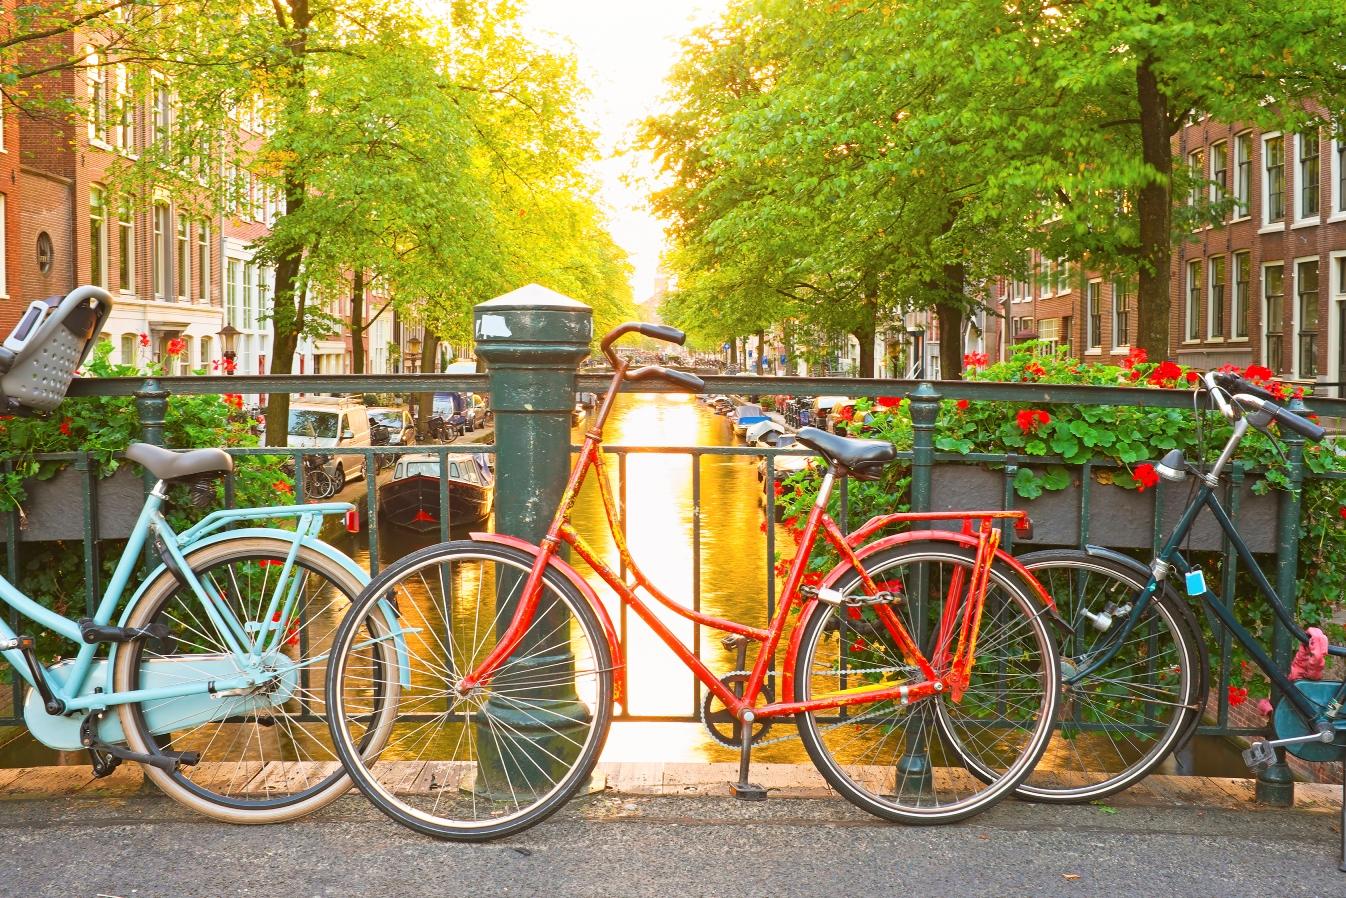 netherlands_amsterdam_bikes_on_the_bridge_istock_000035927814large.jpg